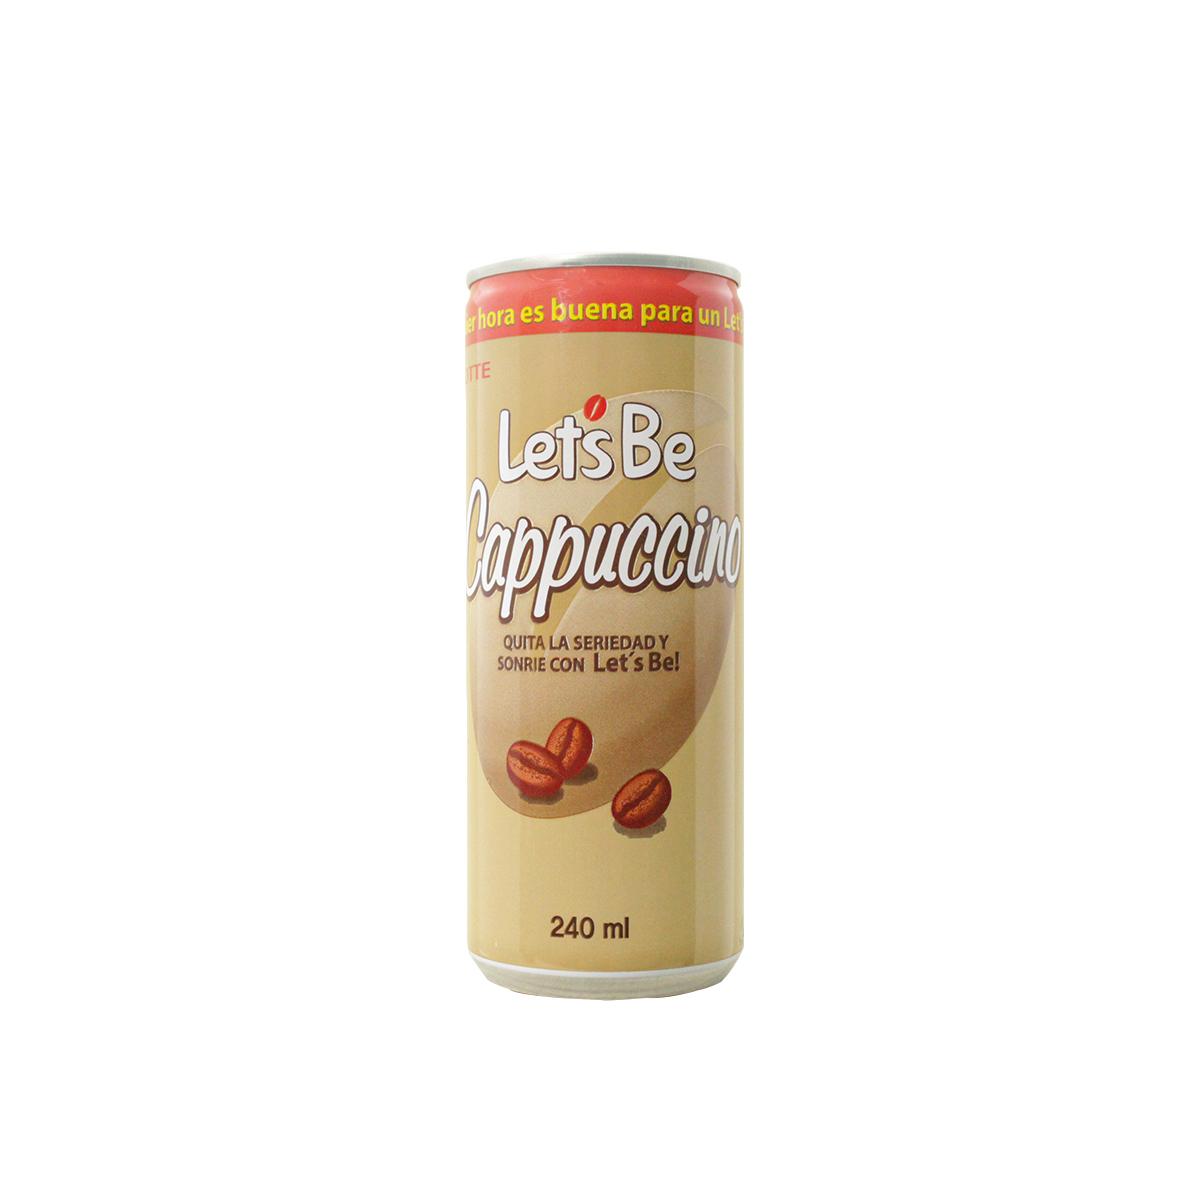 Cafe Coreano Let's Be Cappuccino Lotte 240ml